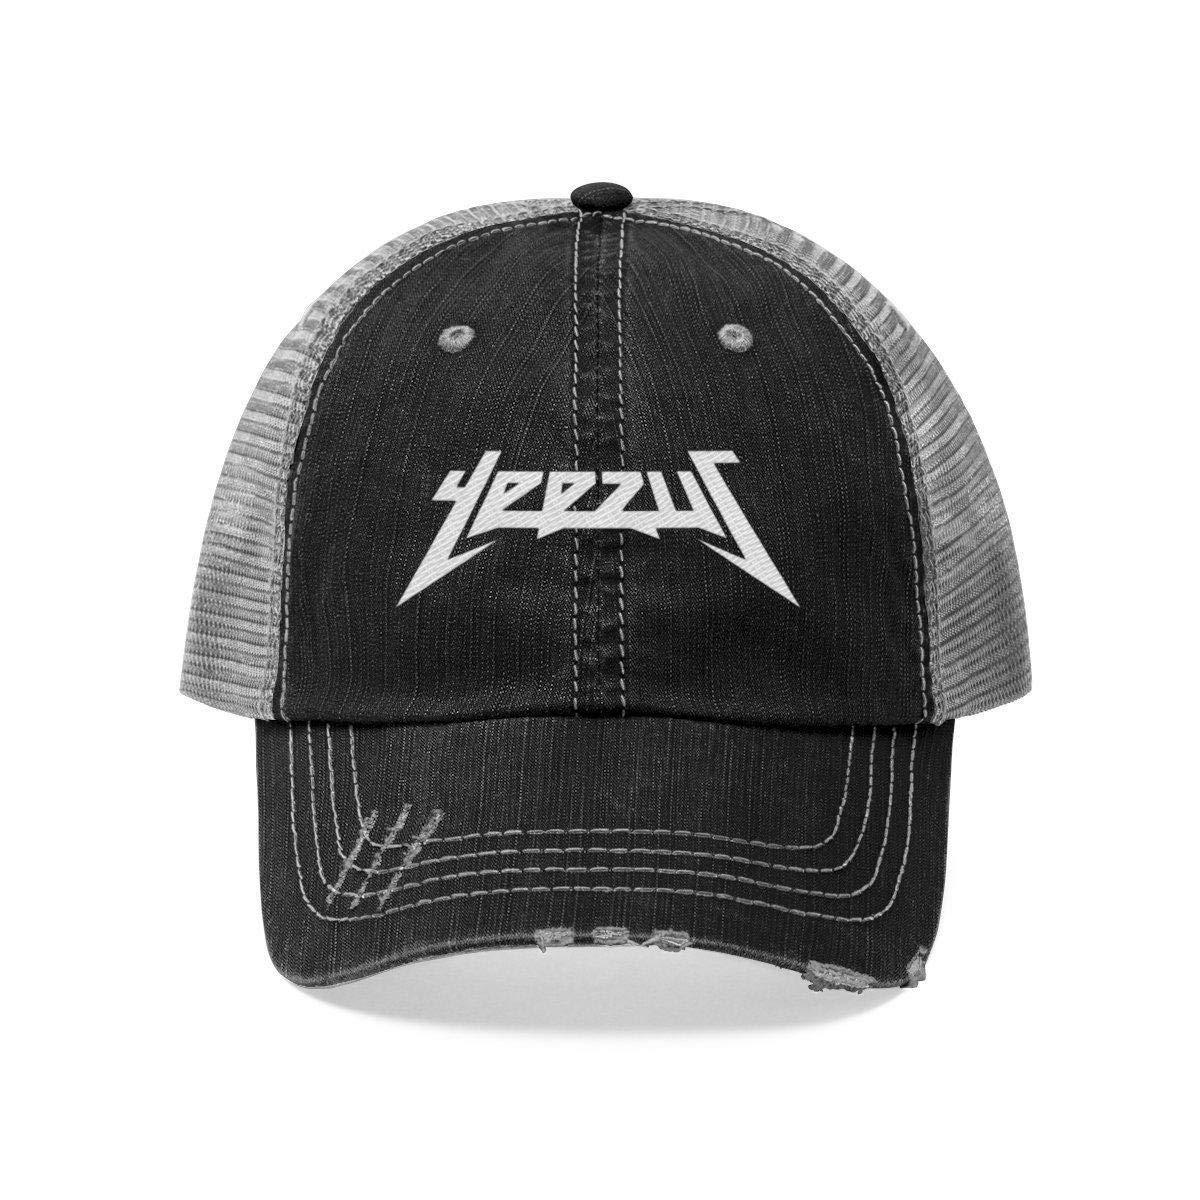 HypeMonsterz Kanye West Yeezus Inspired Unisex Trucker dad hat Cap Black at  Amazon Men s Clothing store  3dce28d8b3d